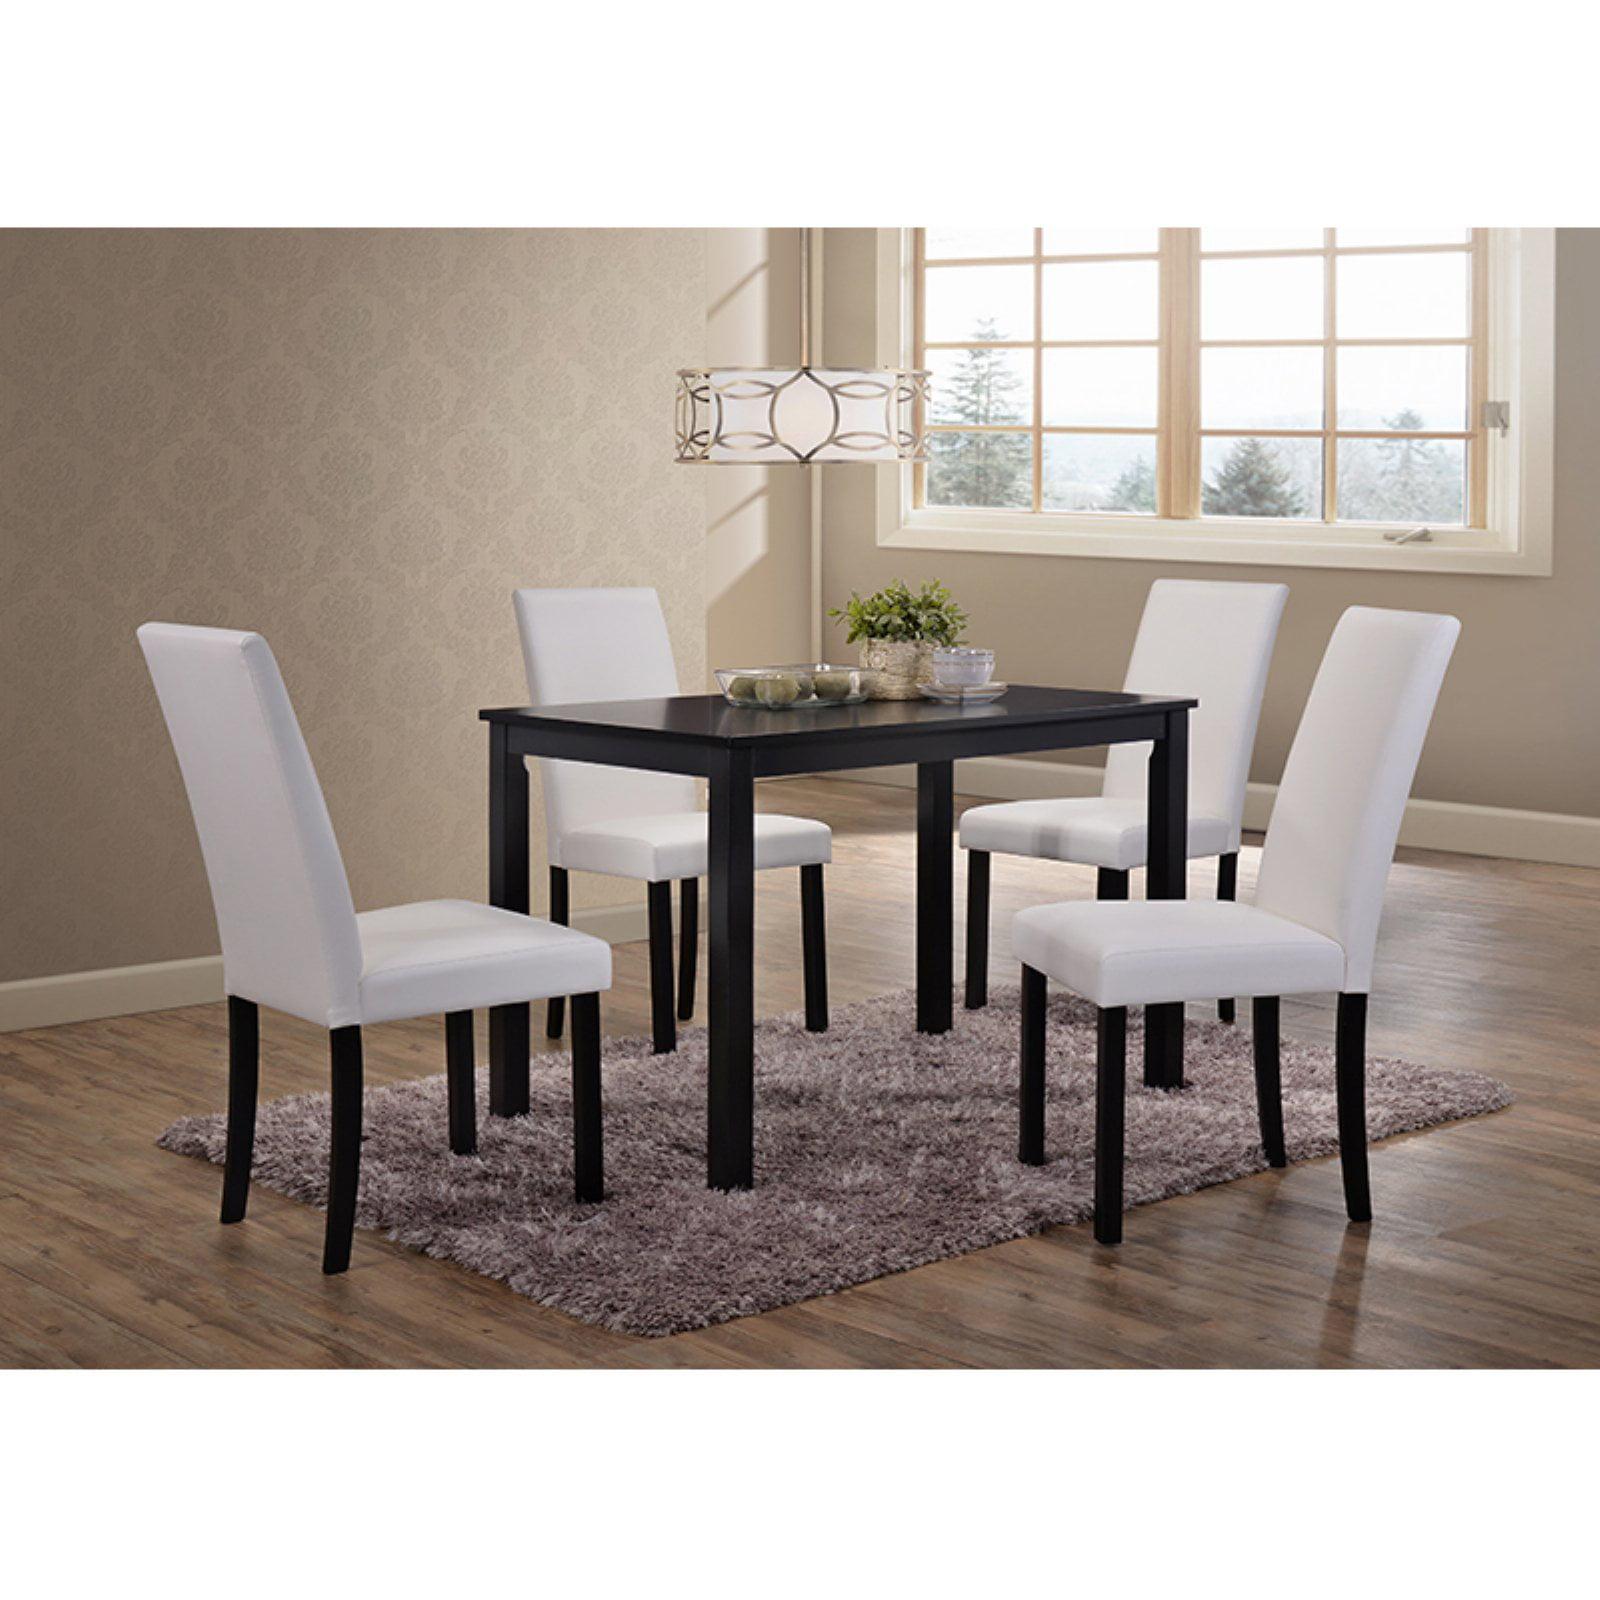 Walmart Dining Chairs: K & B Furniture Melrose Dining Chair